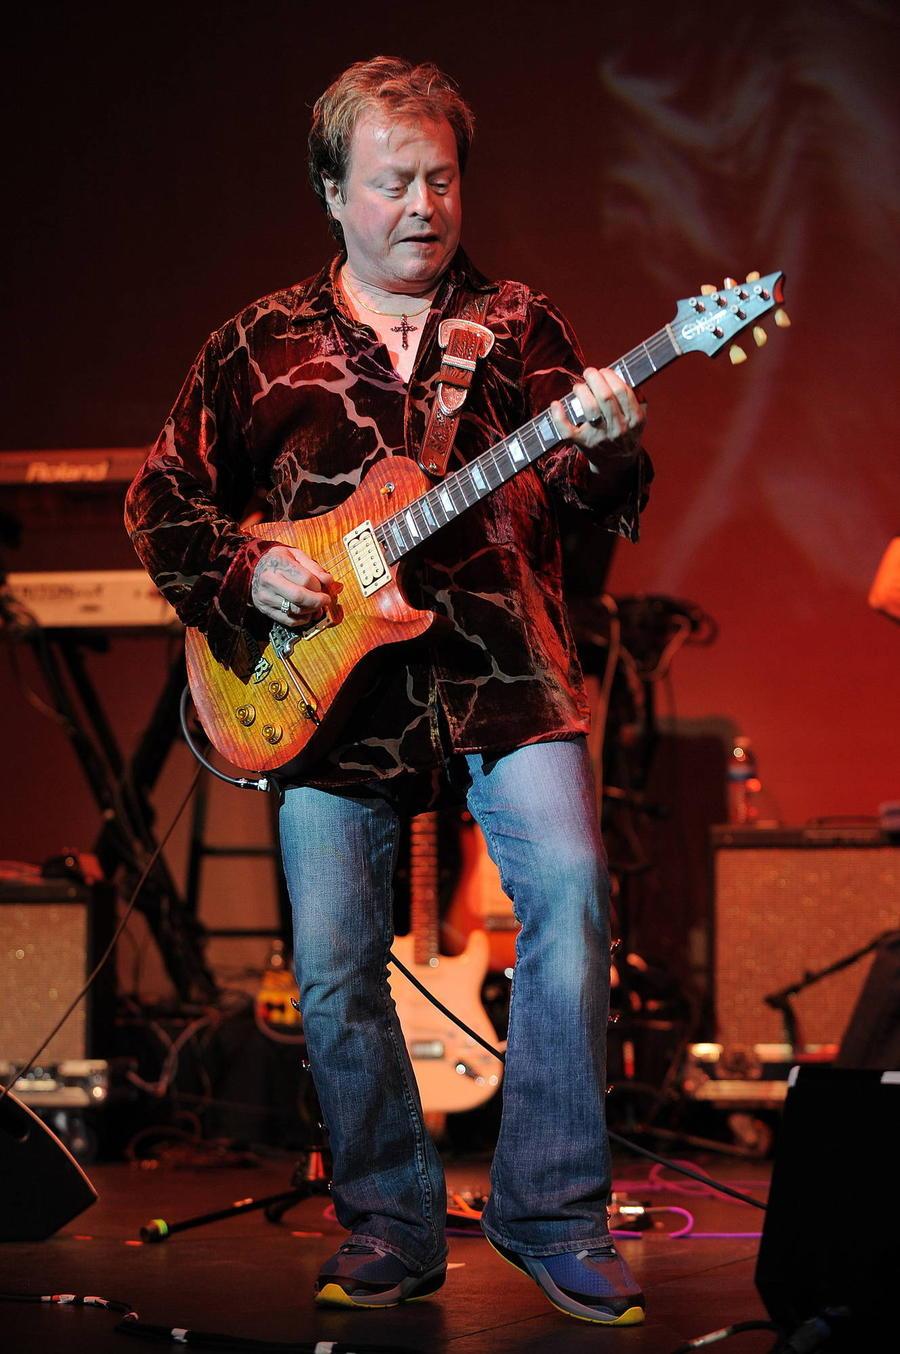 Guitarist Rick Derringer In Trouble For Carrying Loaded Gun On Flight